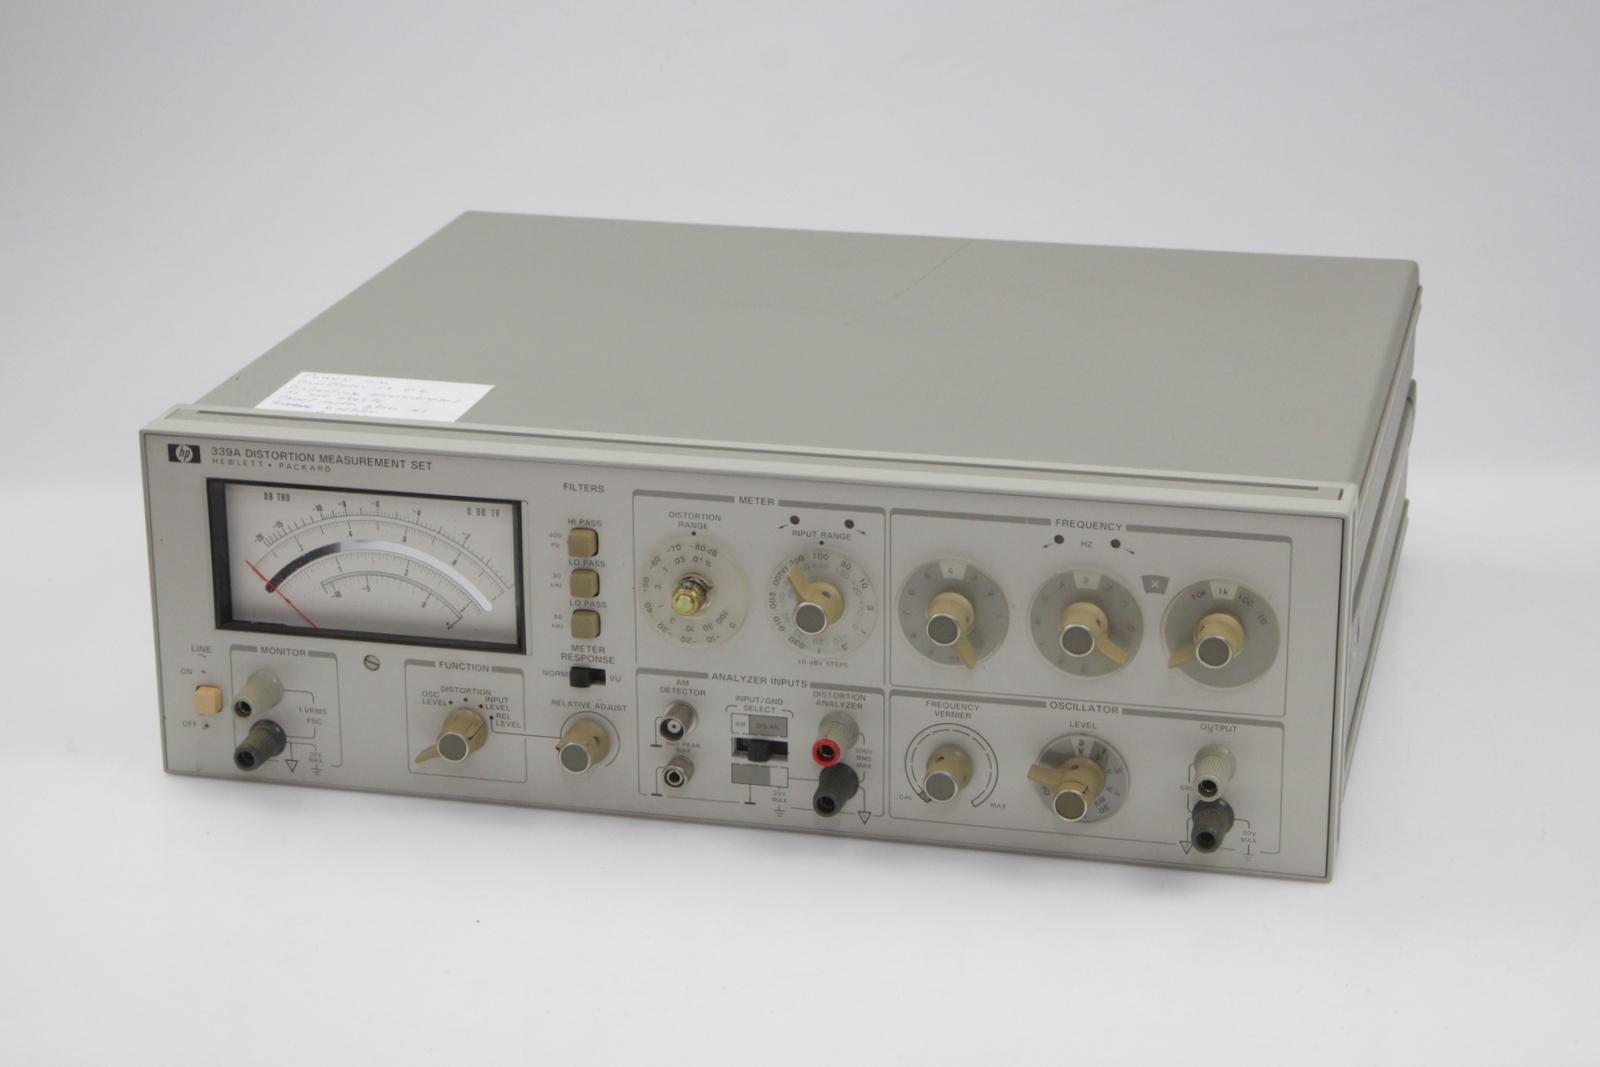 Details about Hp Hewlett Packard 339A Distortion Analyser #6